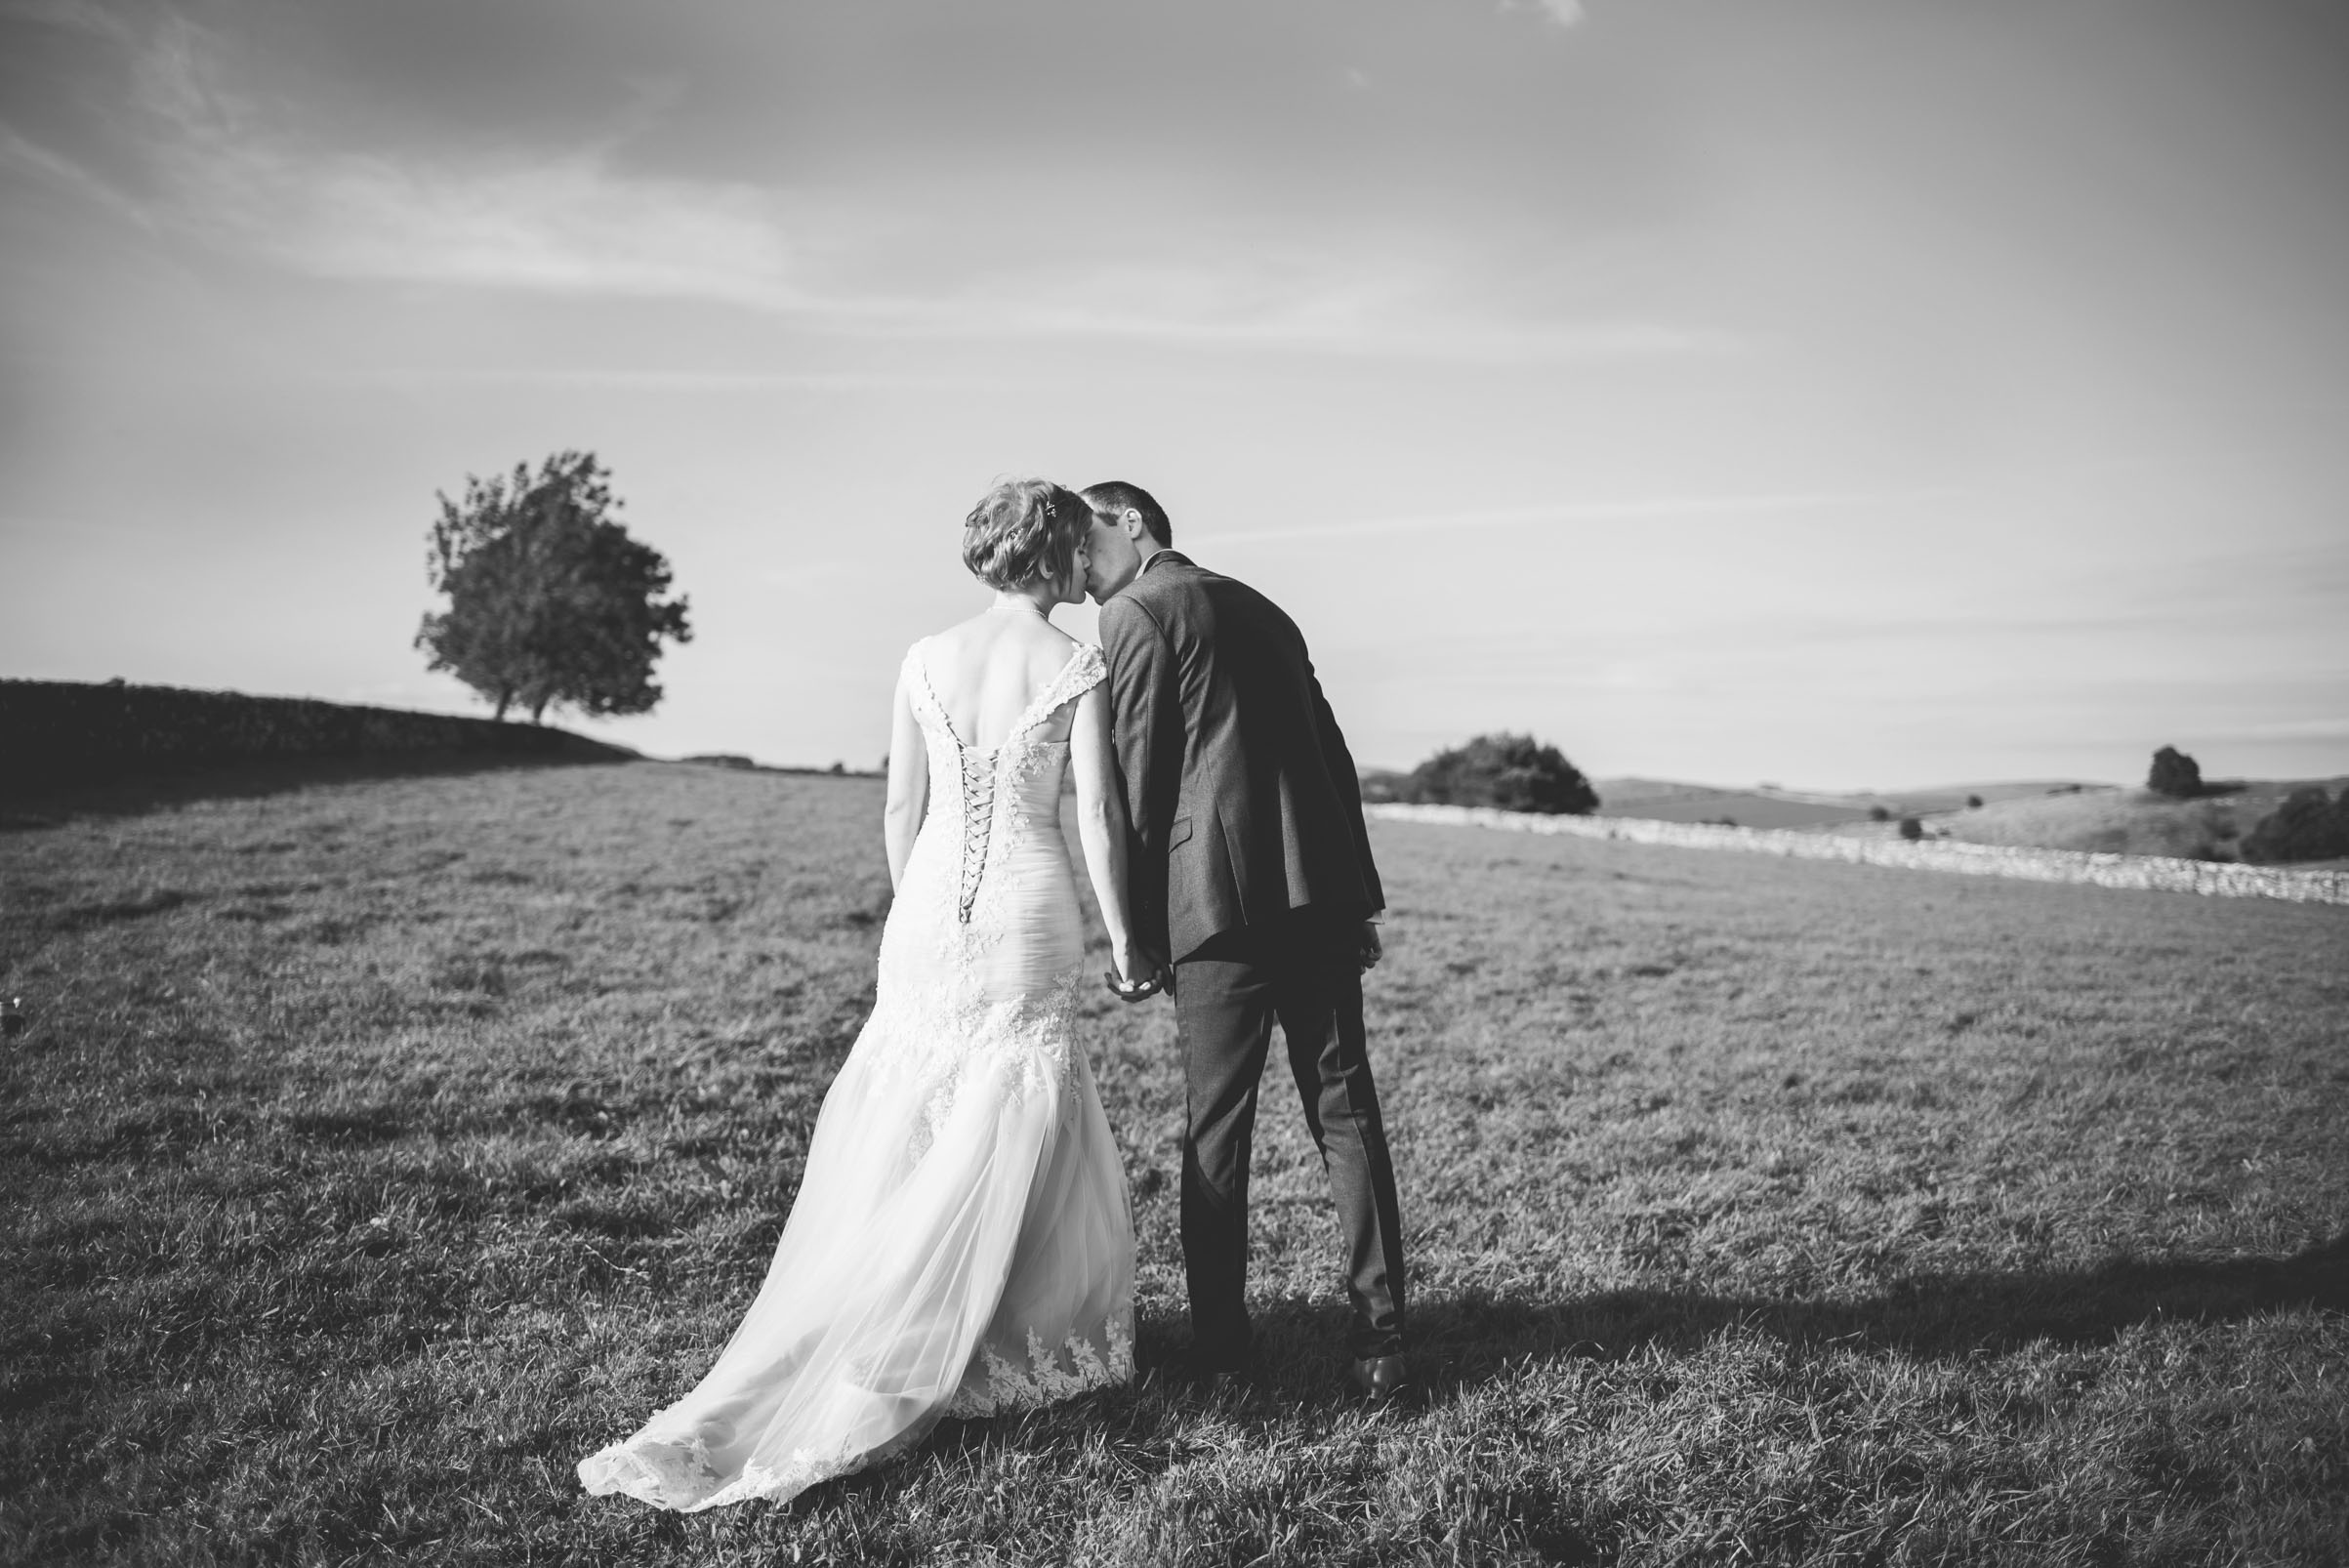 Peak+district+farm+wedding+lower+damgate+photographer-198.jpg